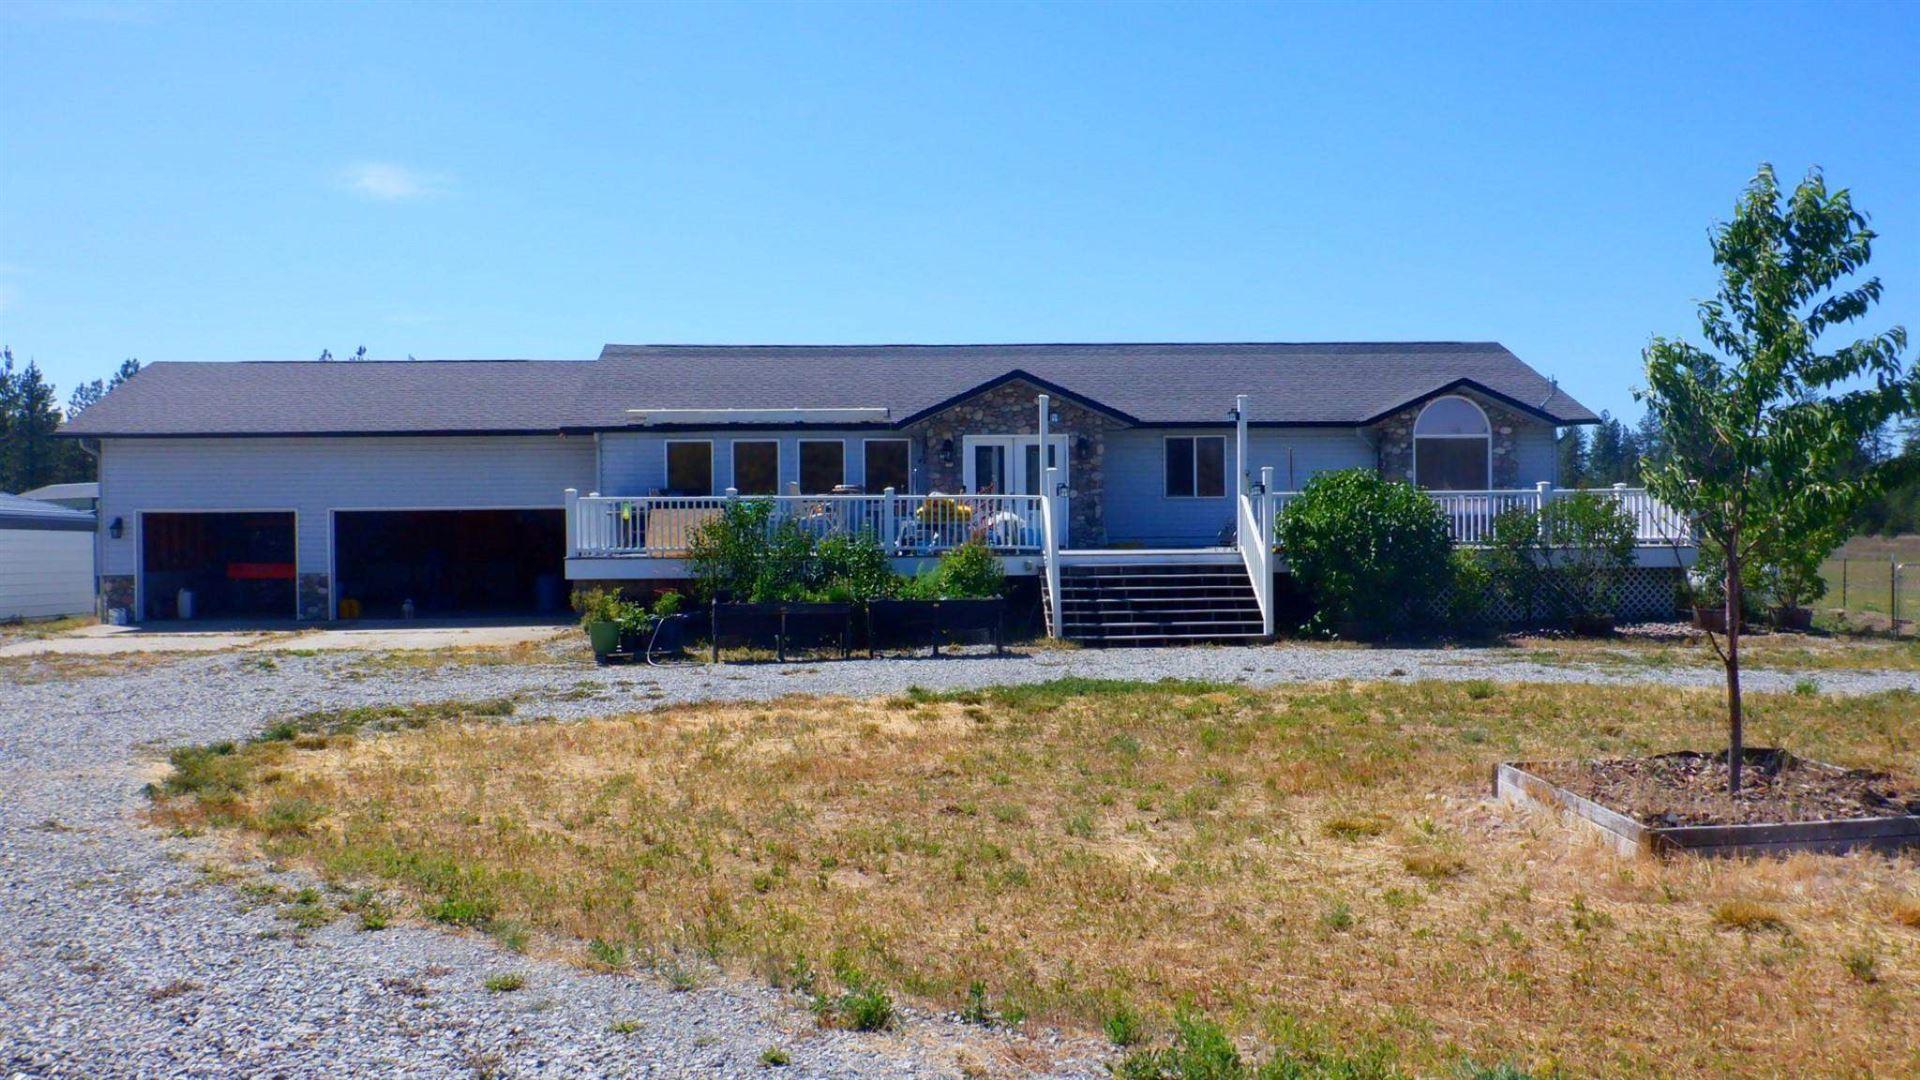 32919 N Newport Hwy, Chattaroy, WA 99003 - #: 202117866